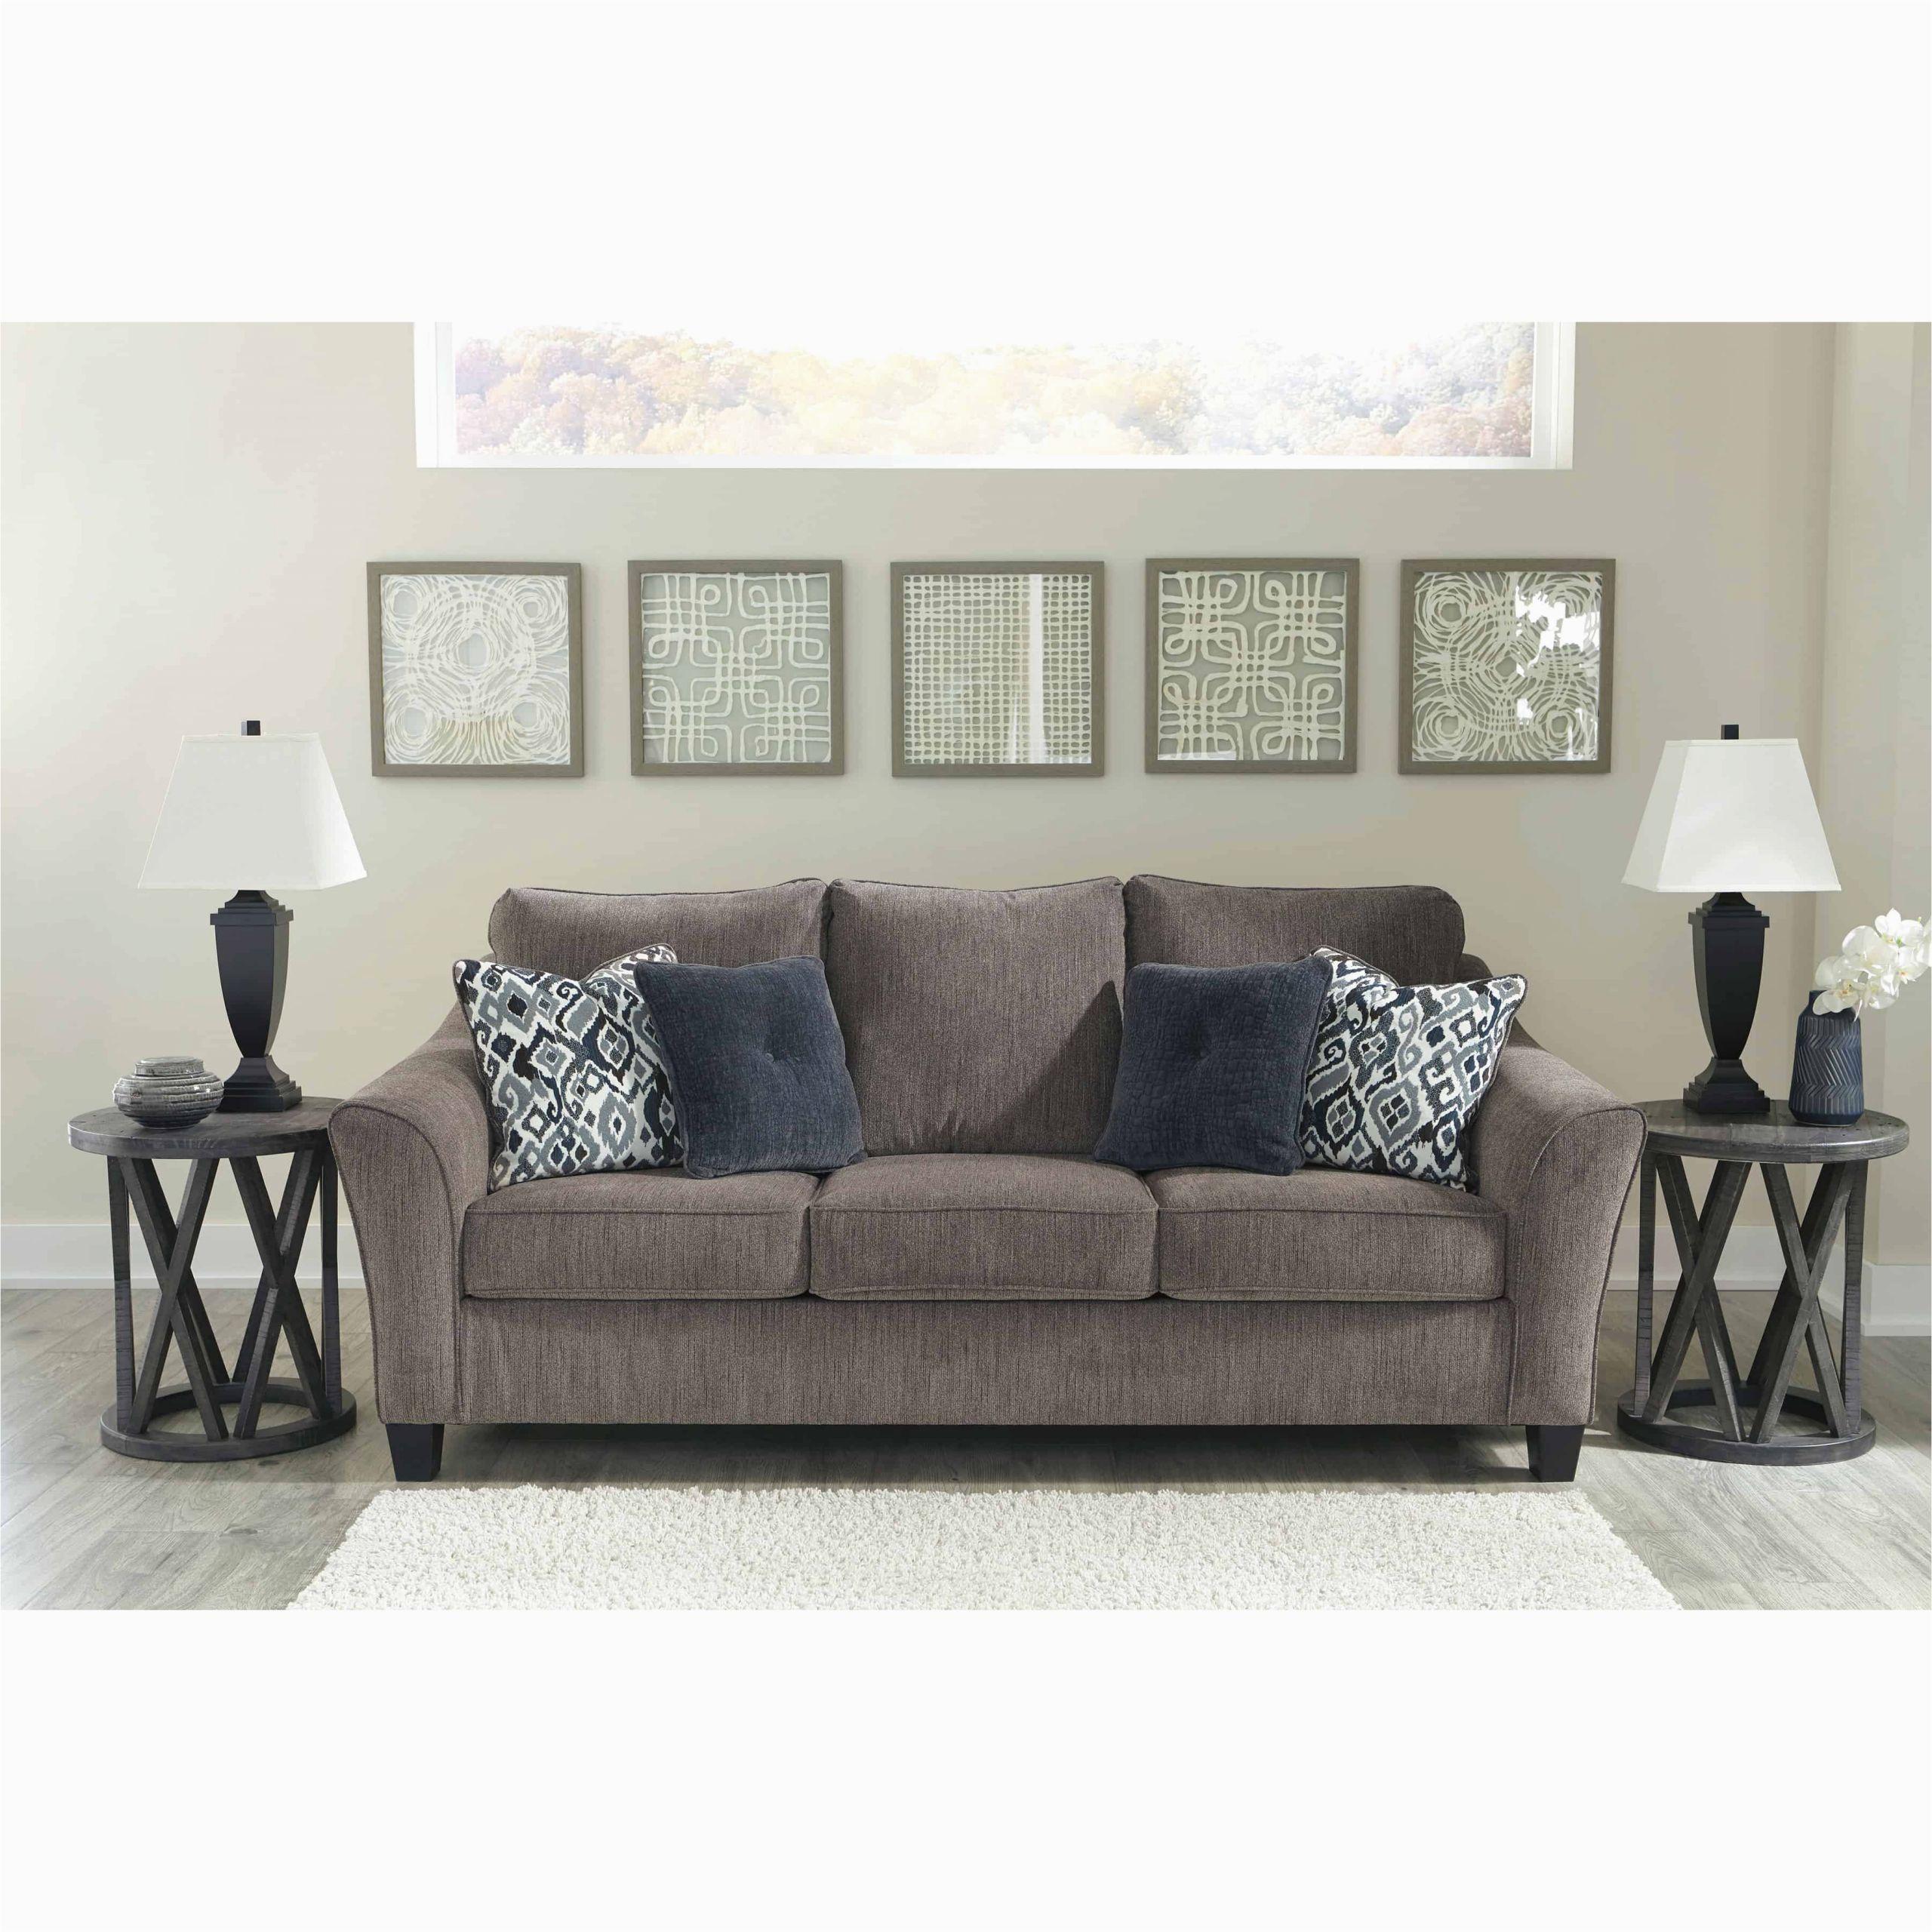 Signature Design by ashley Queen Sleeper sofa Nemoli Slate Queen Sleeper sofa